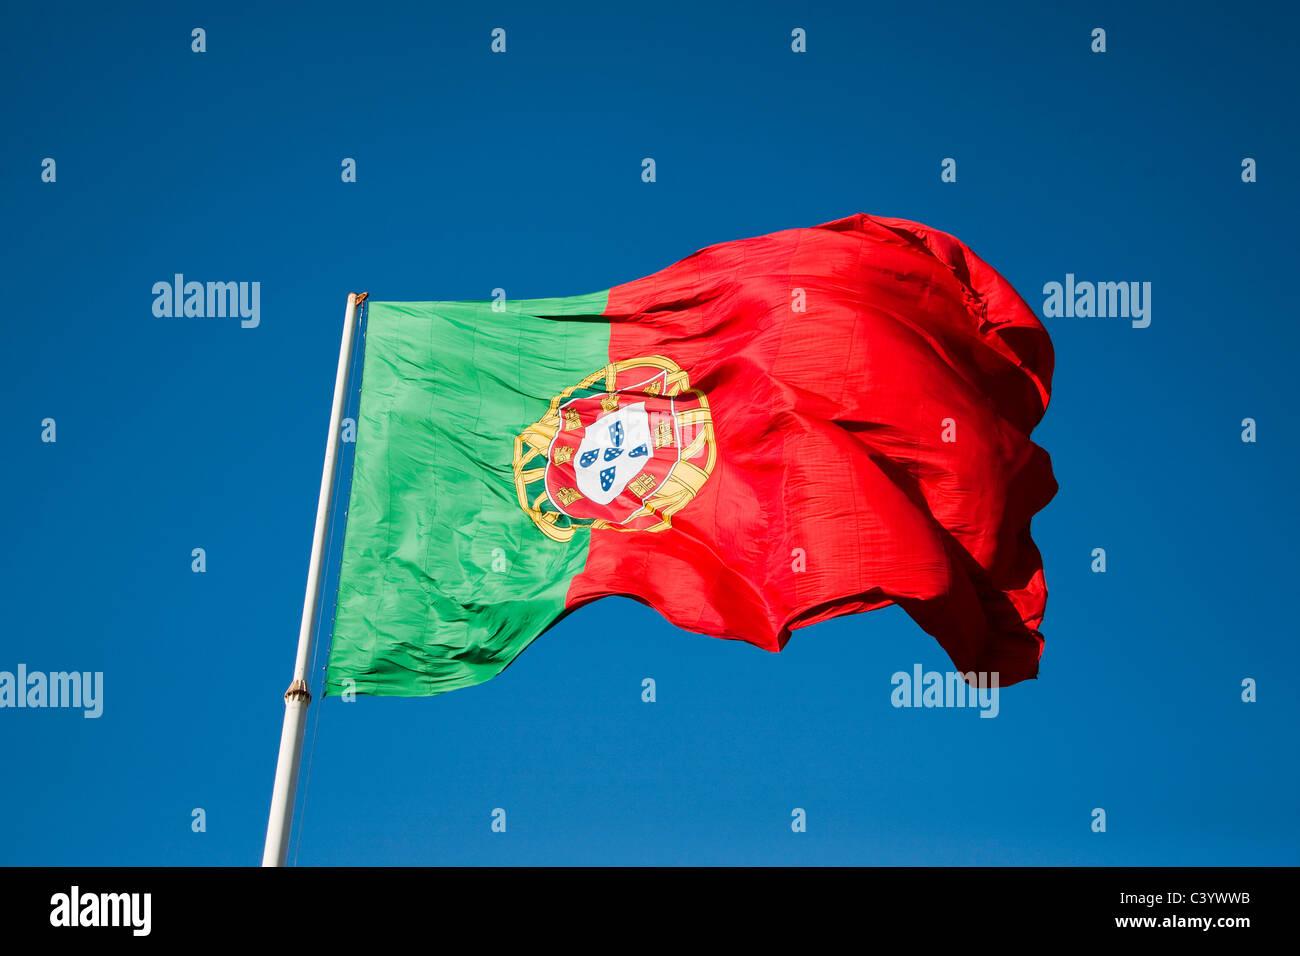 Portugal, Europe, flag, banner, flag, green, red - Stock Image